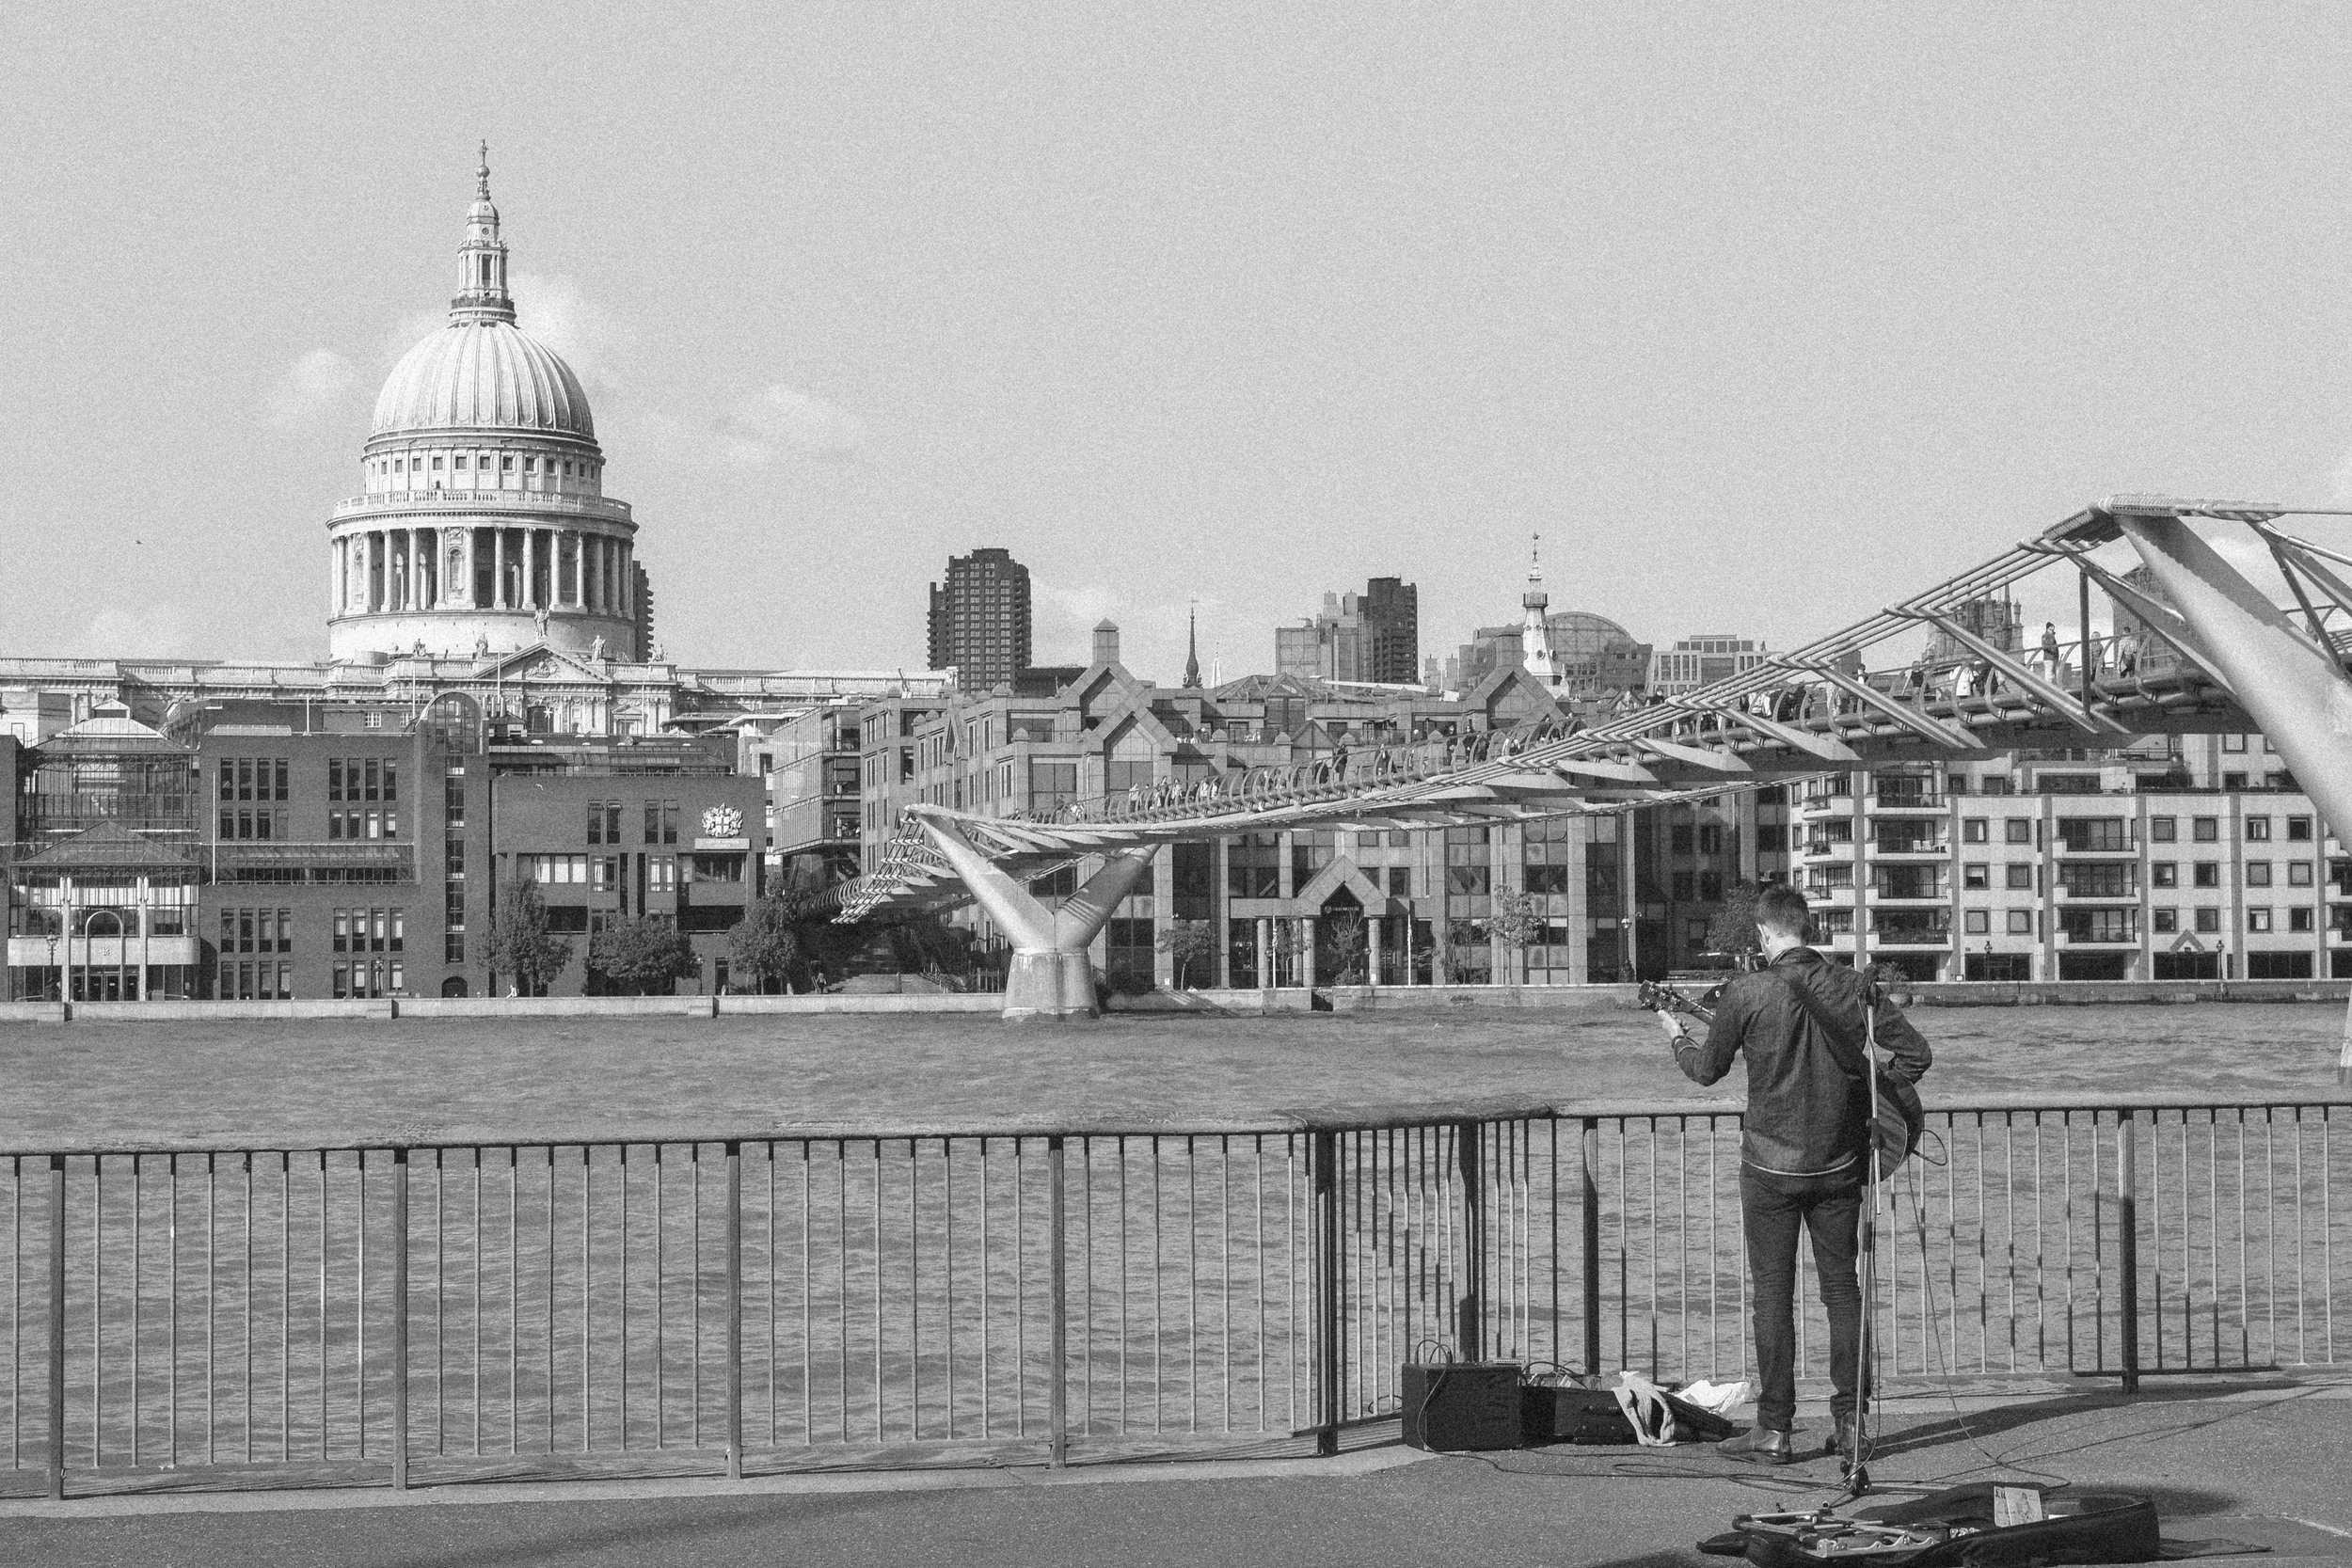 billie norman southbank london busking